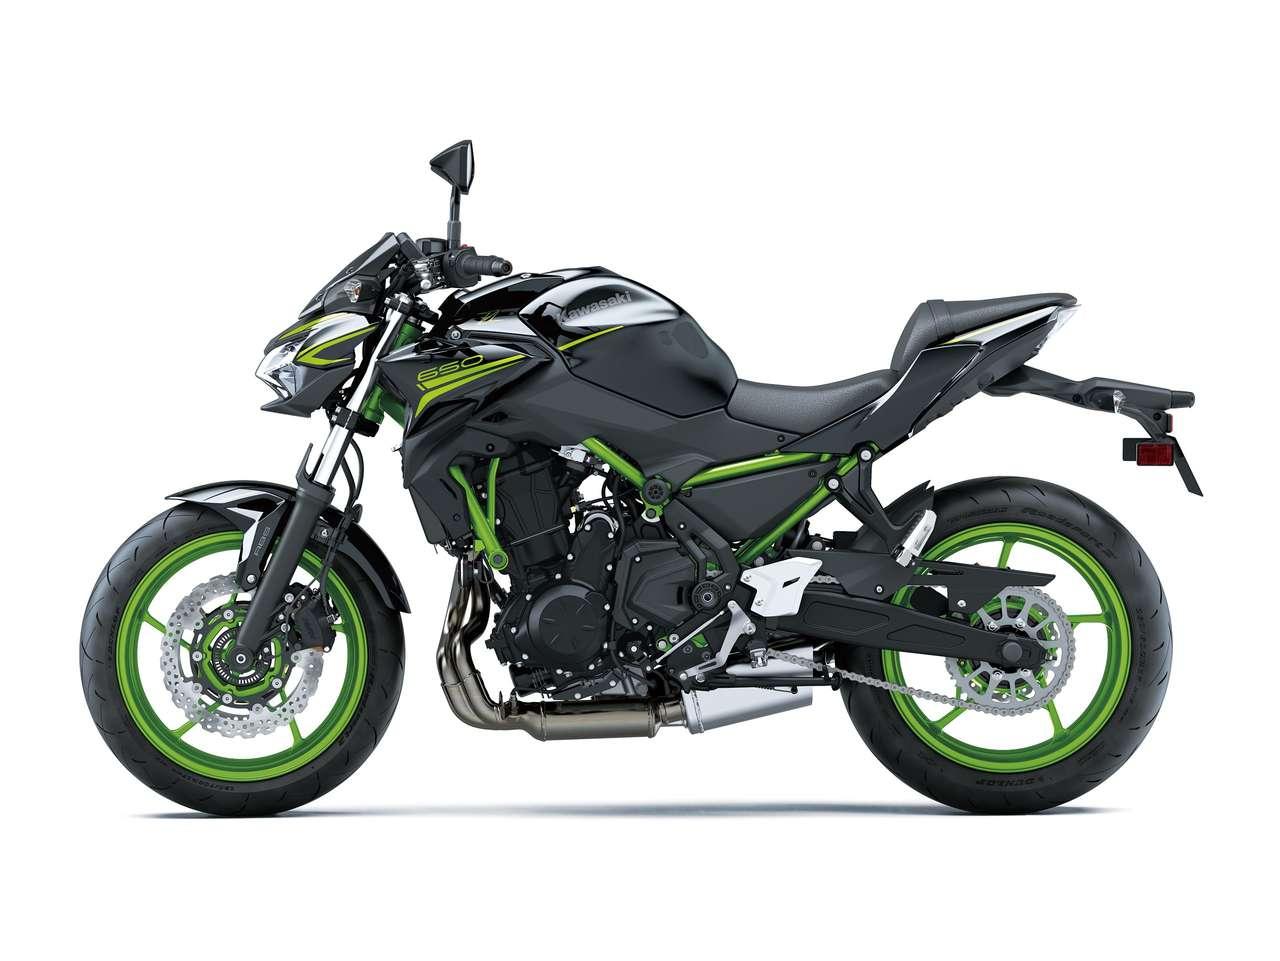 Kawasaki Z650 2021: Metallic Spark Black